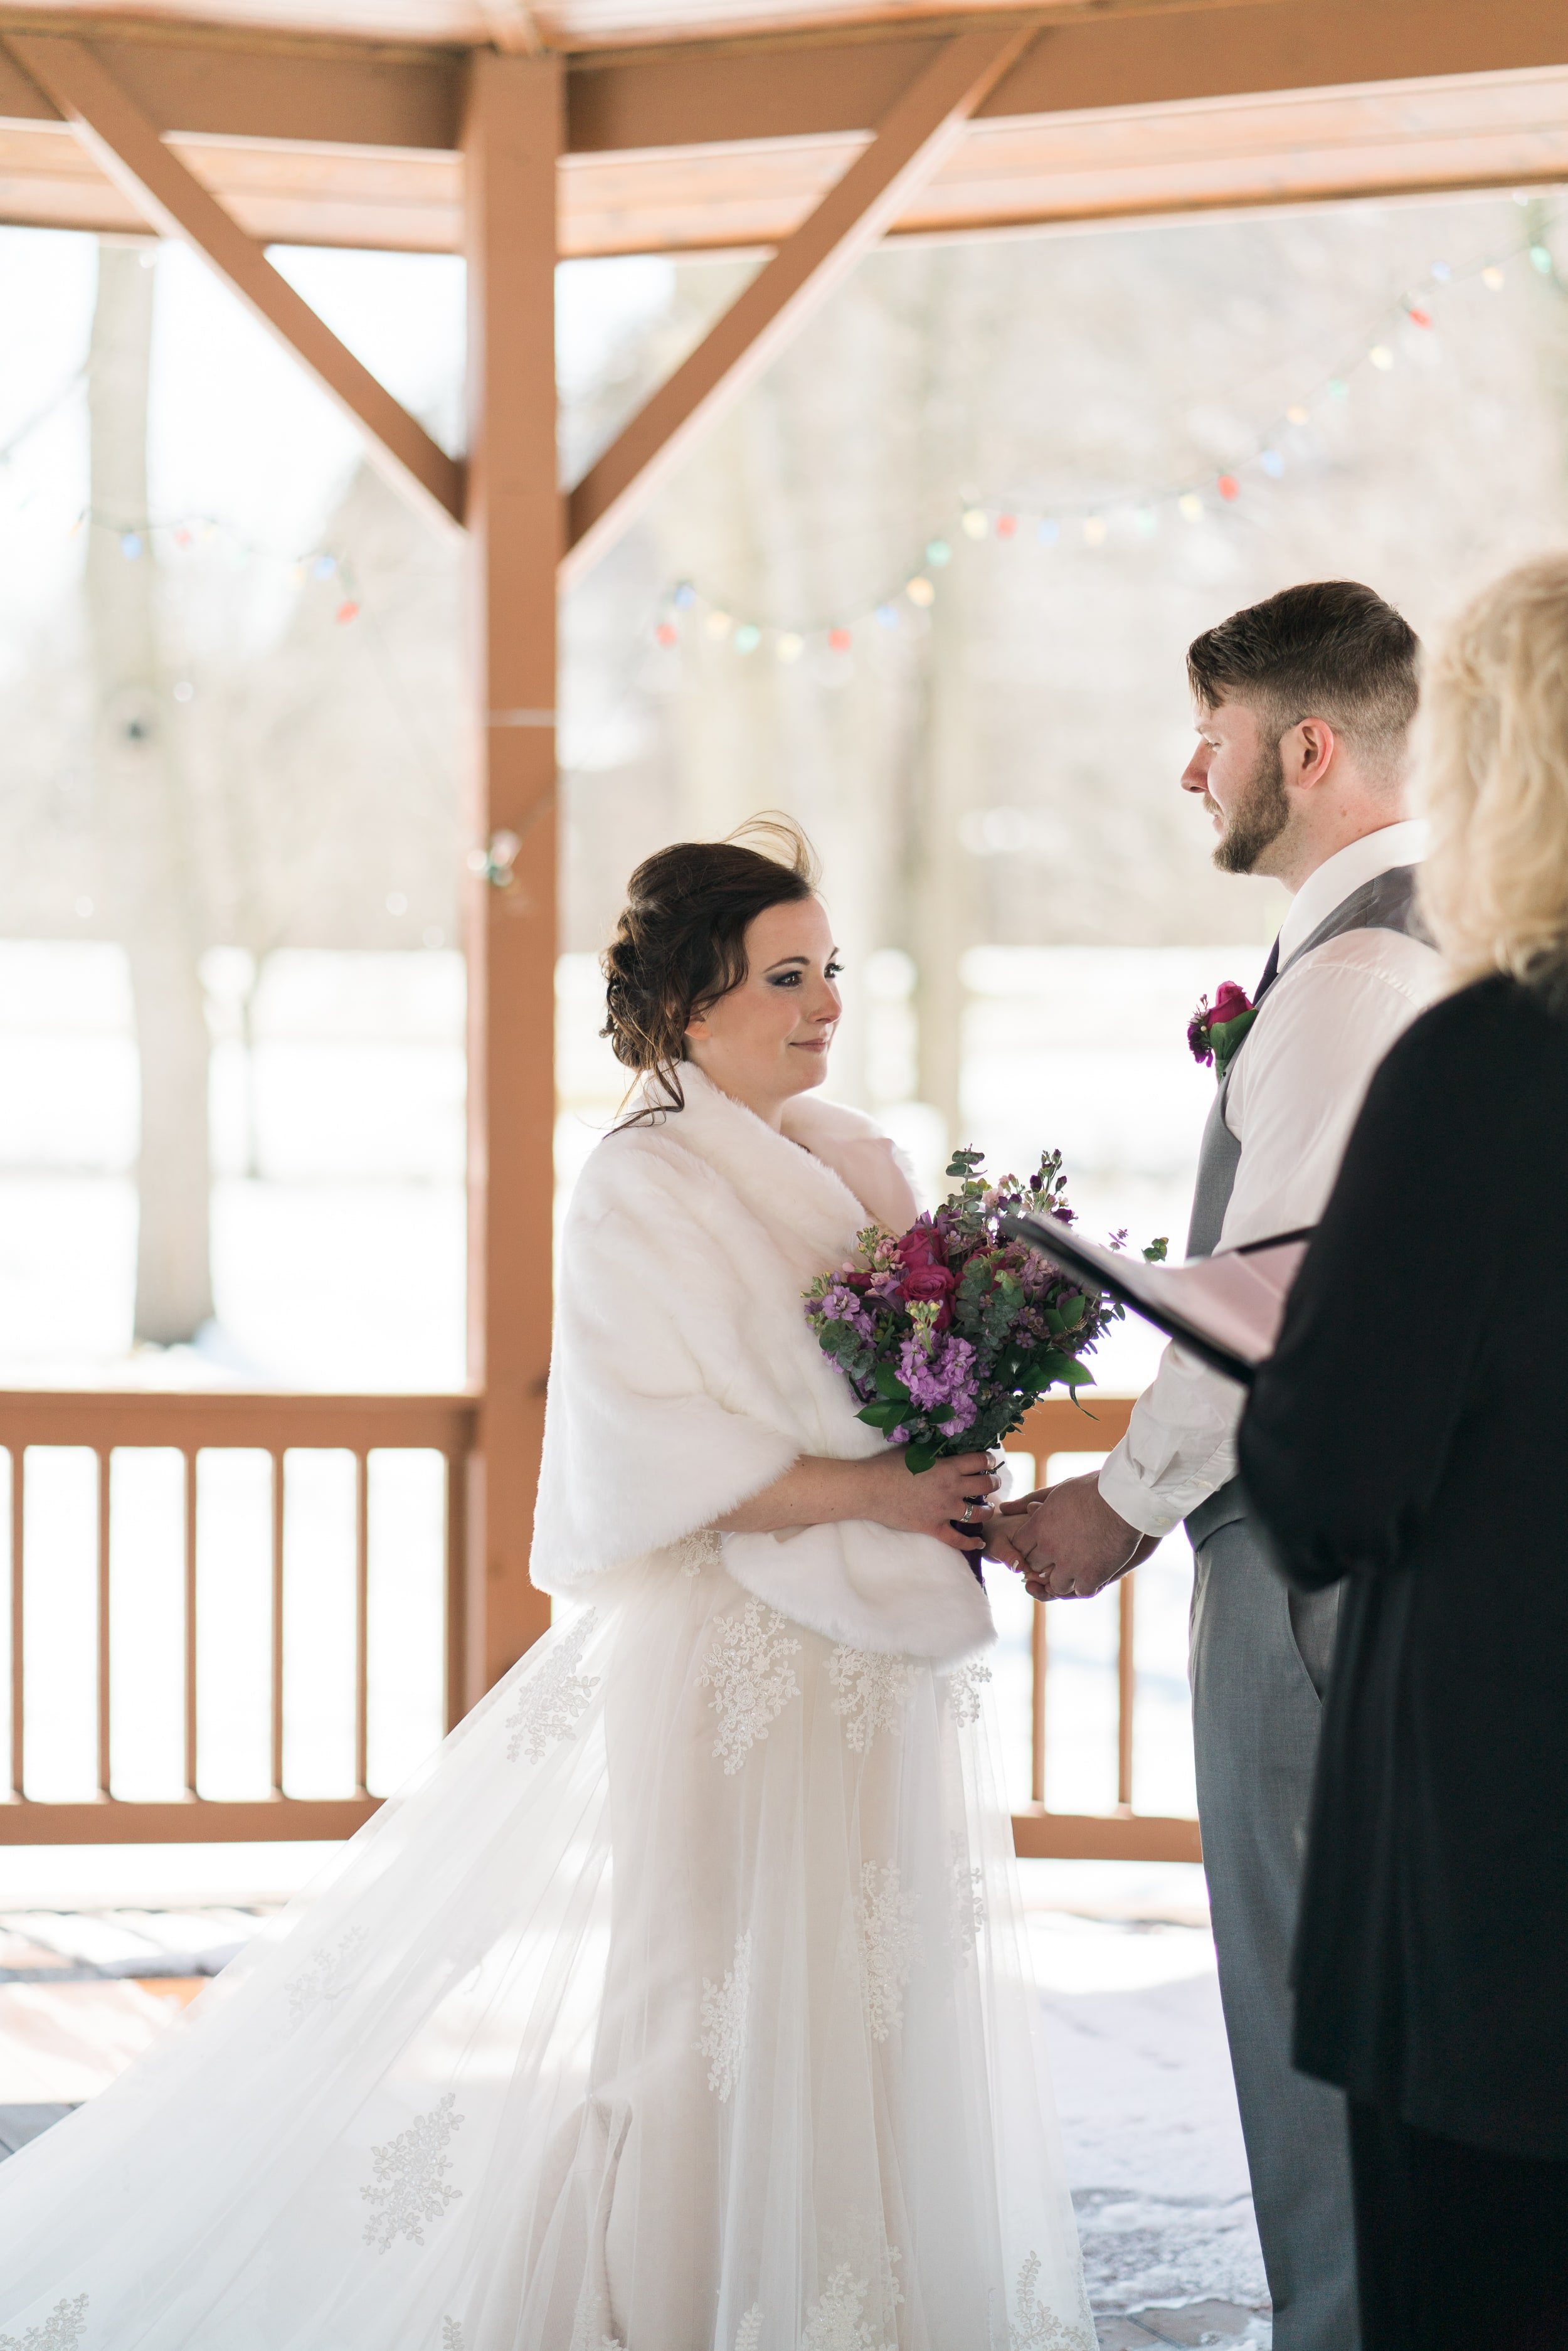 snowy-intimate-wedding-29.jpg